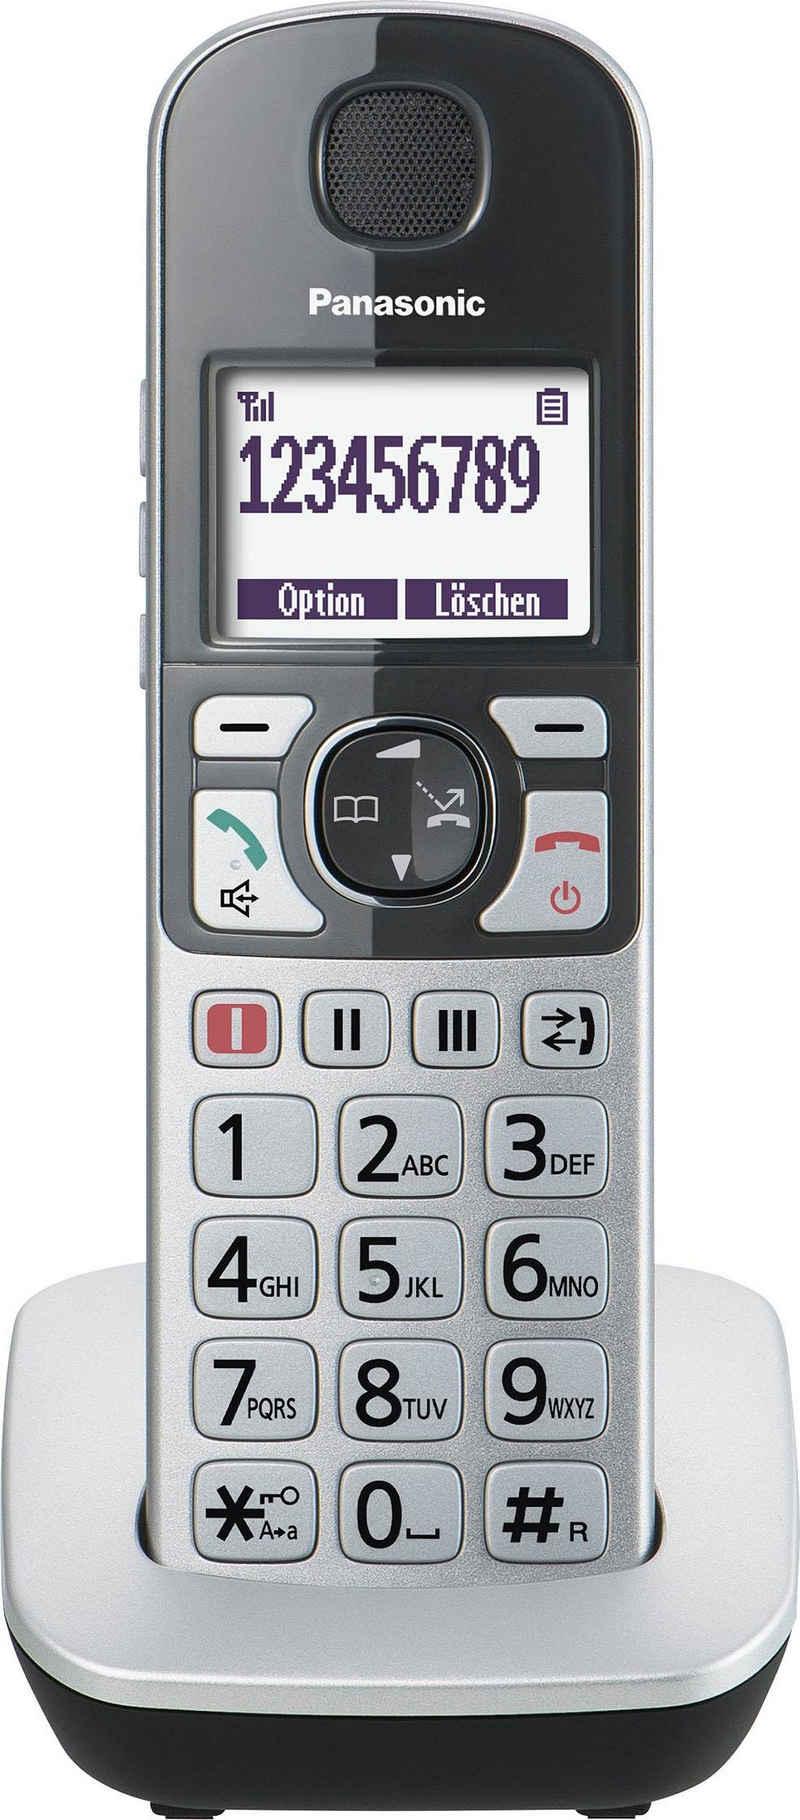 Panasonic »KX-TGQ500« Seniorentelefon (Mobilteile: 1, mit IP-Technologie)